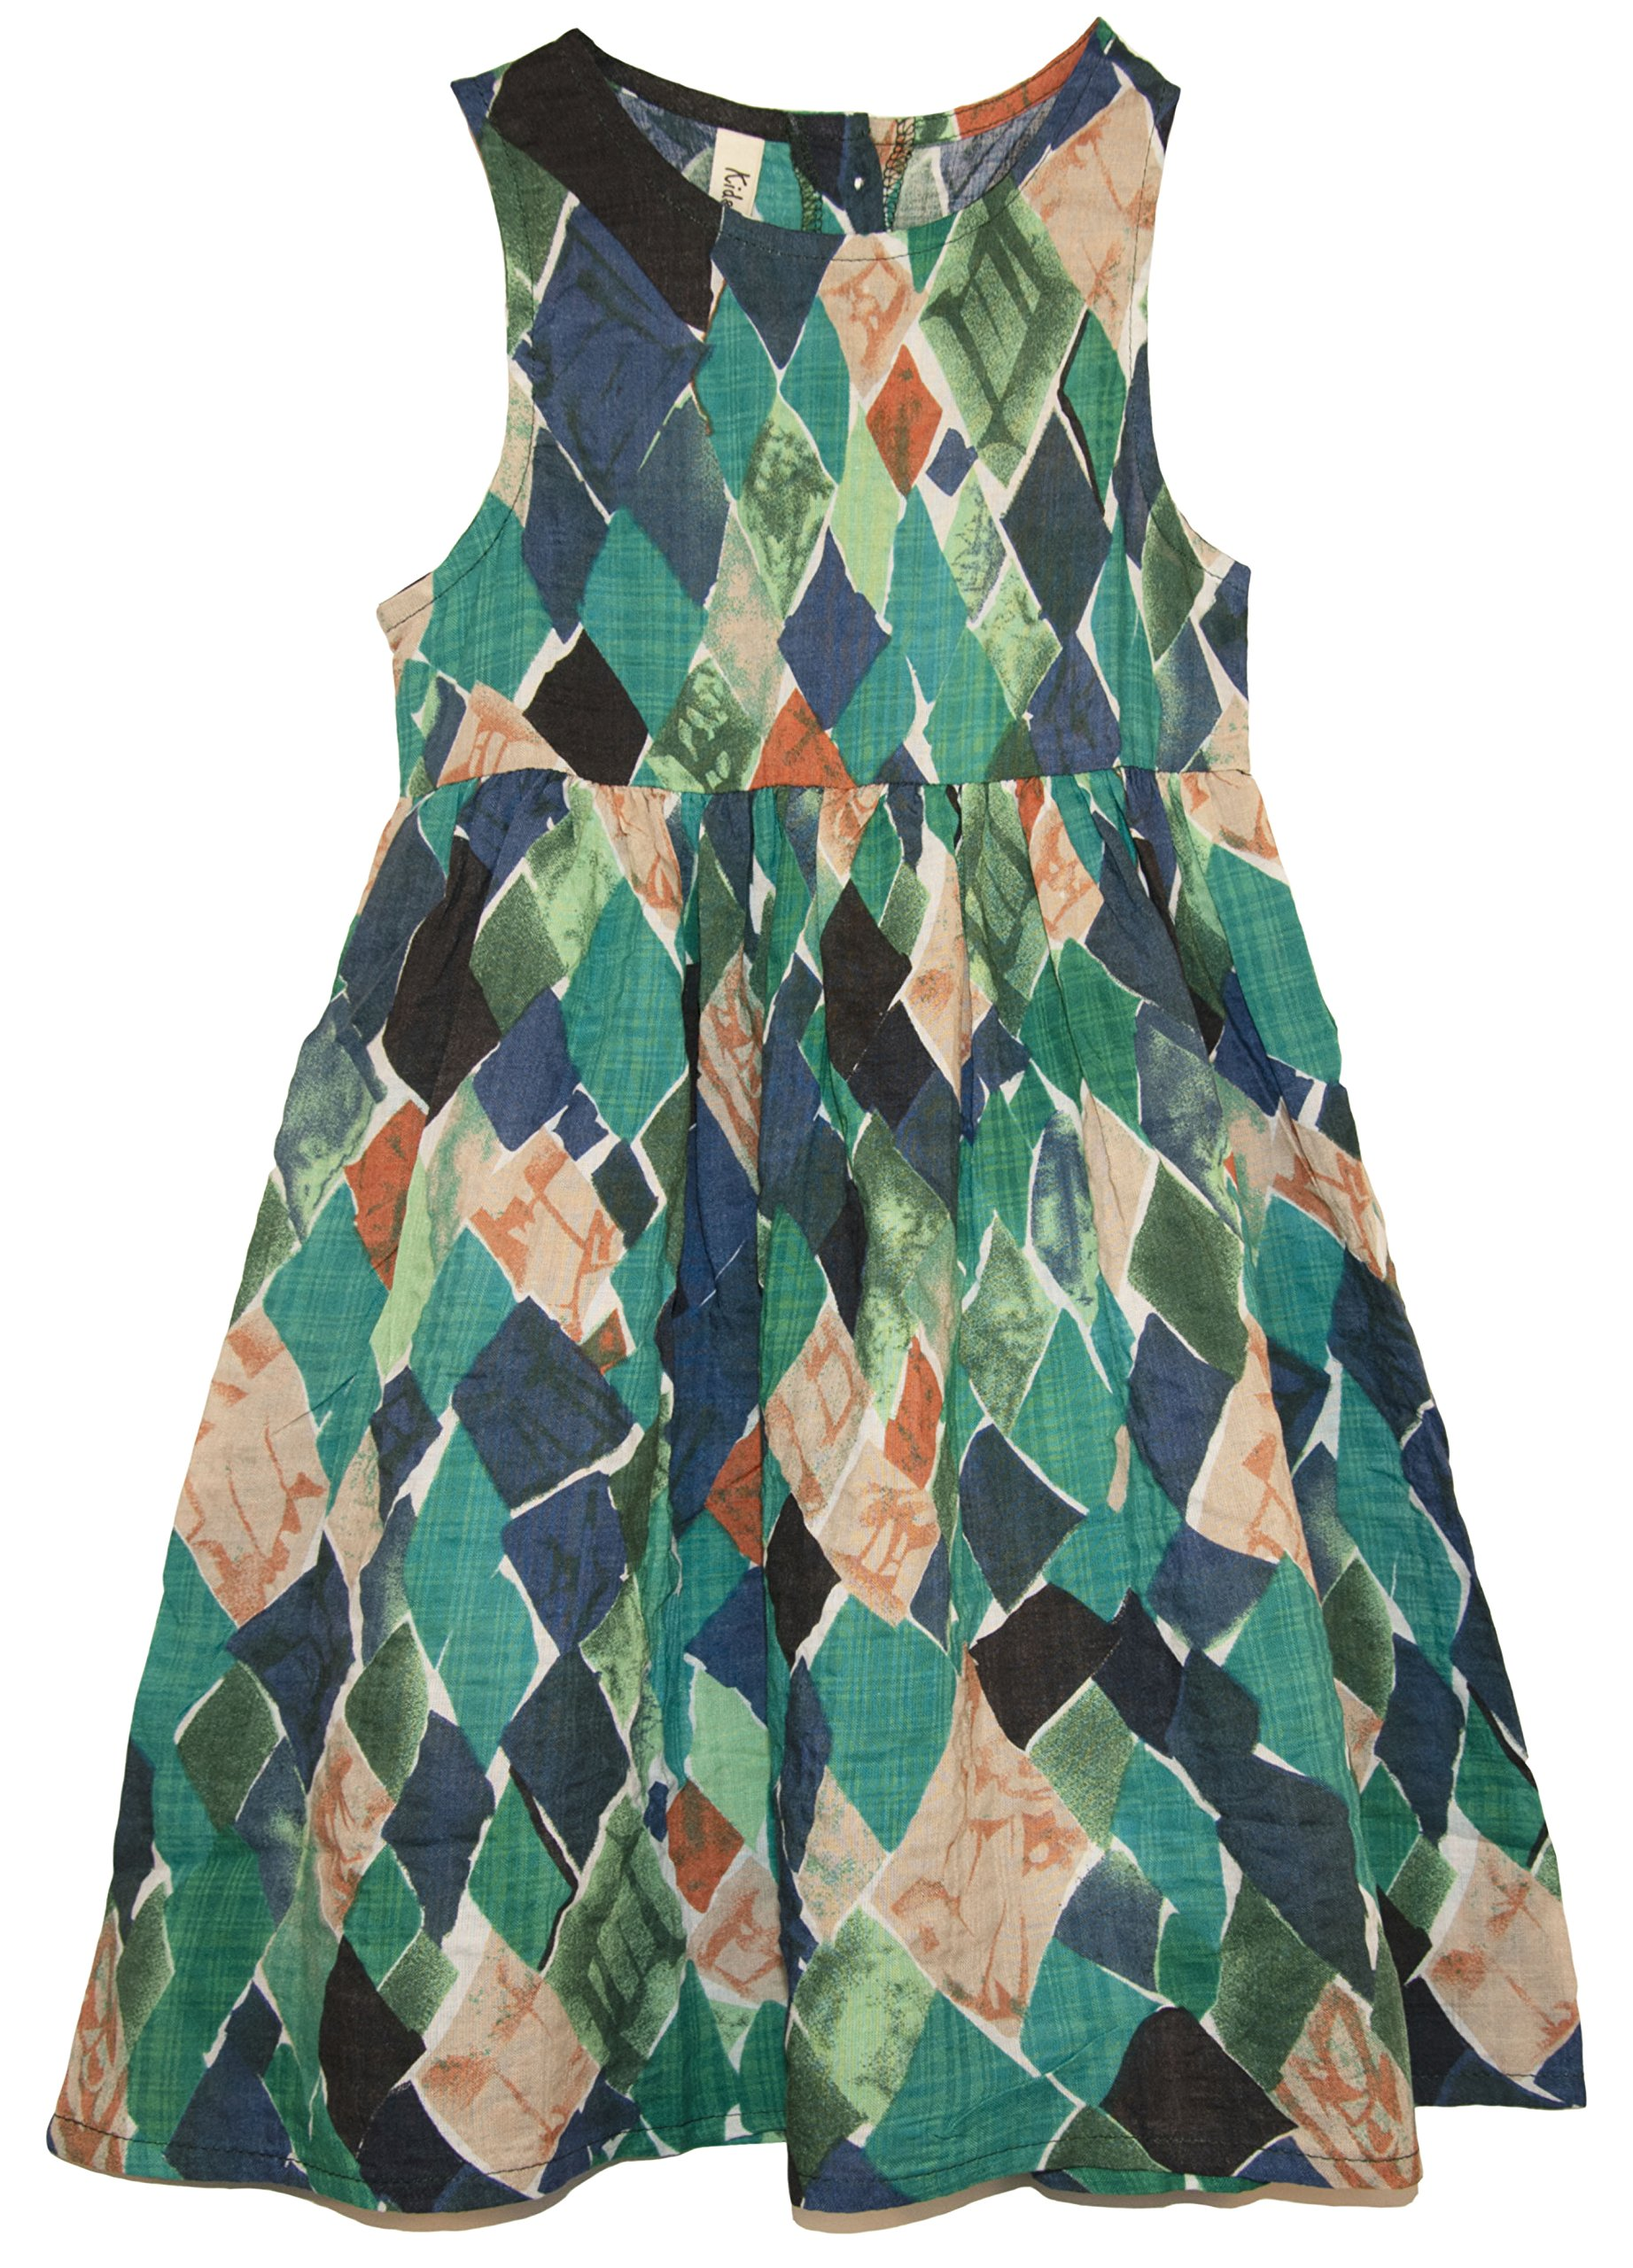 ContiKids Girls' Asymmetric Diamond Pattern Sleeveless Dress 13 Green